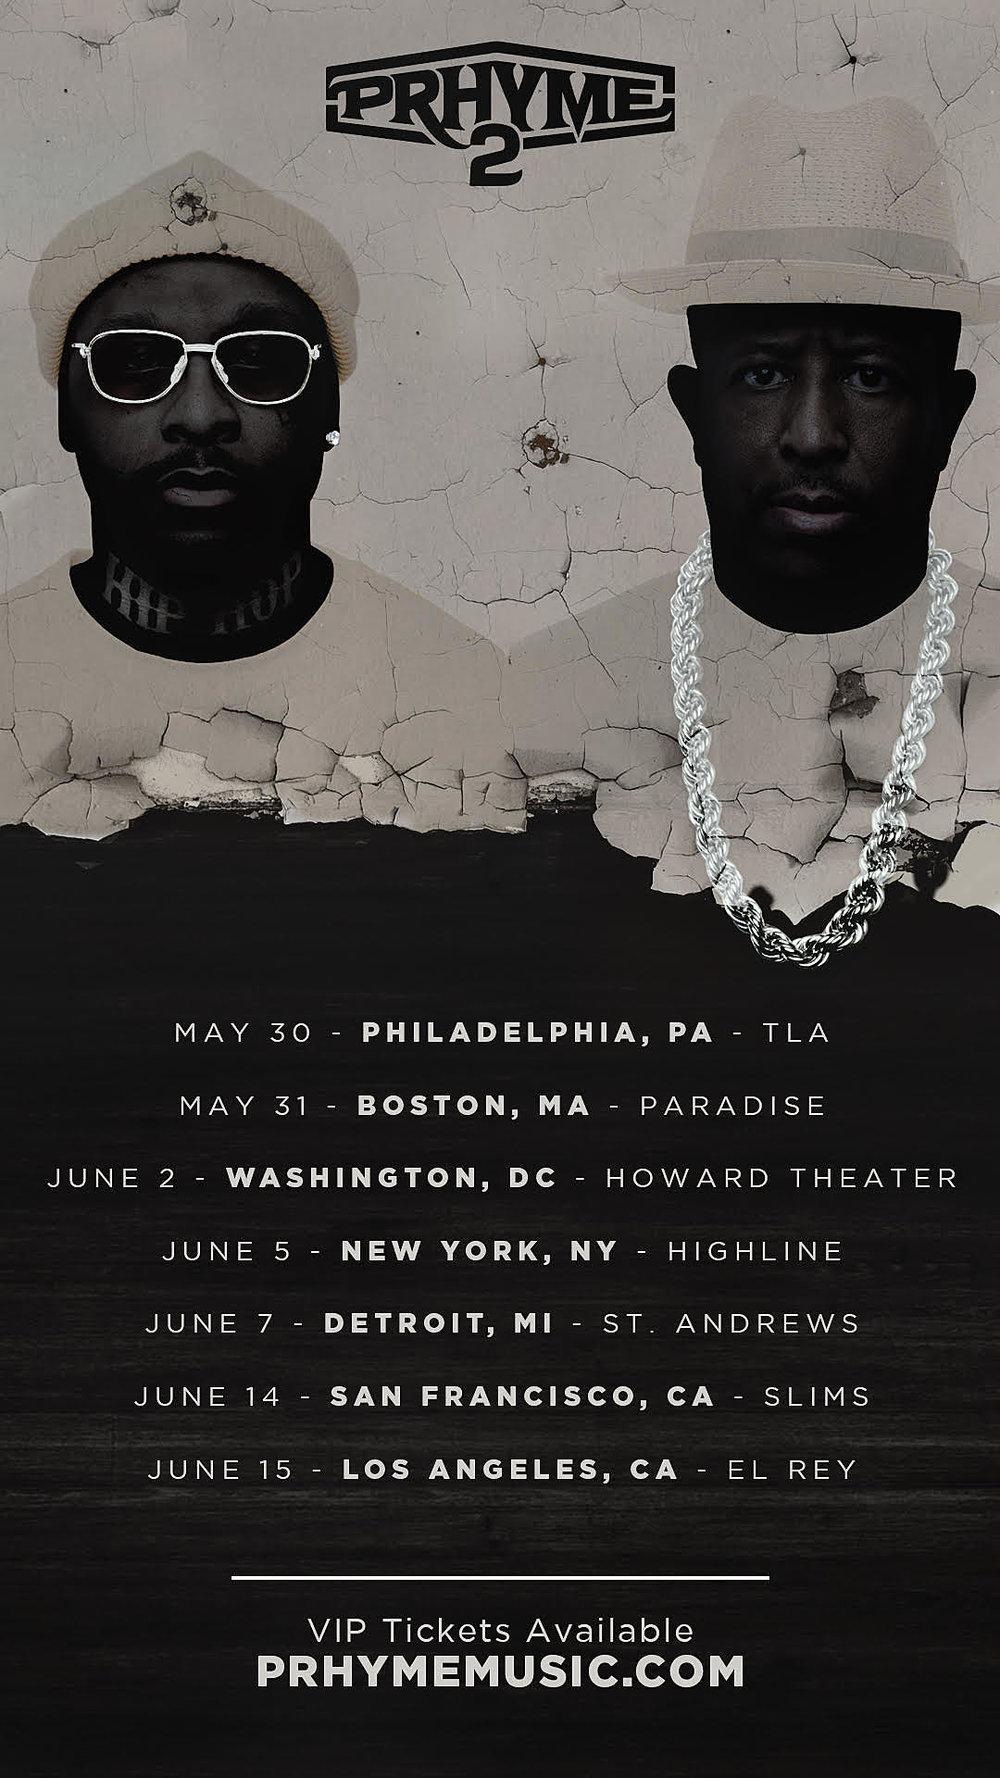 prhyme-tour-dates.jpg